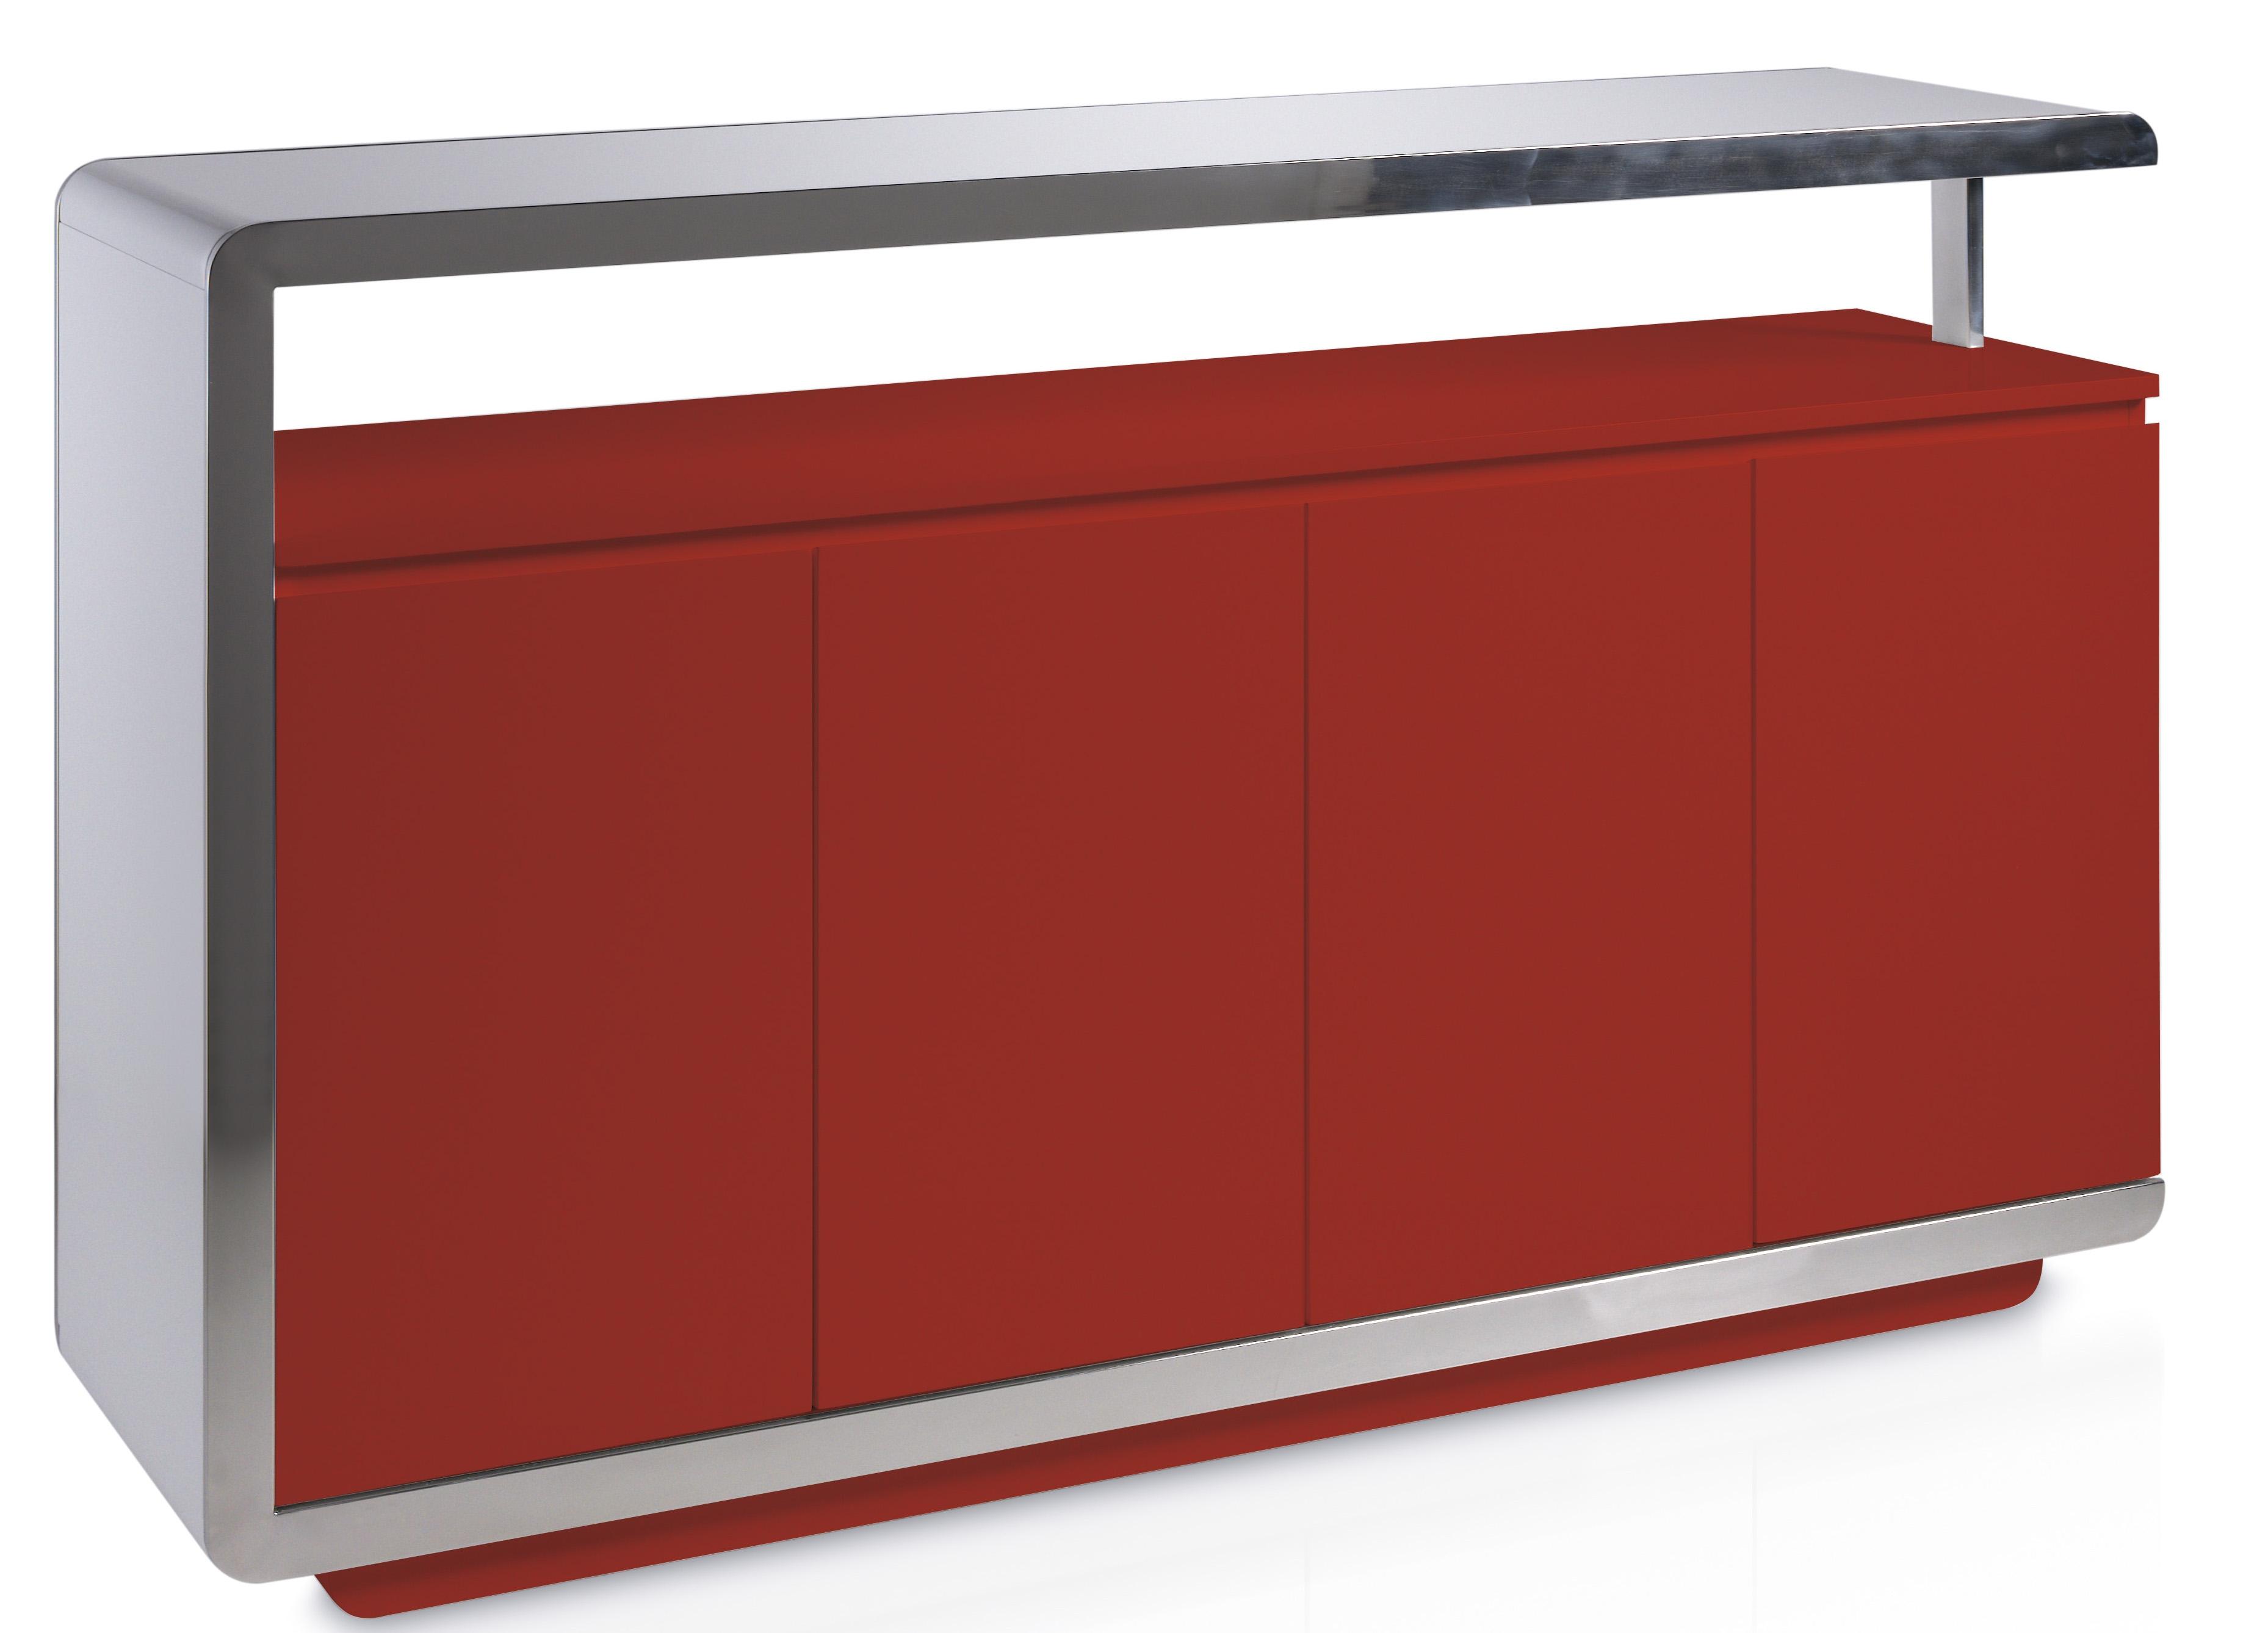 buffet laqu rouge et acier inoxydable poli modena. Black Bedroom Furniture Sets. Home Design Ideas